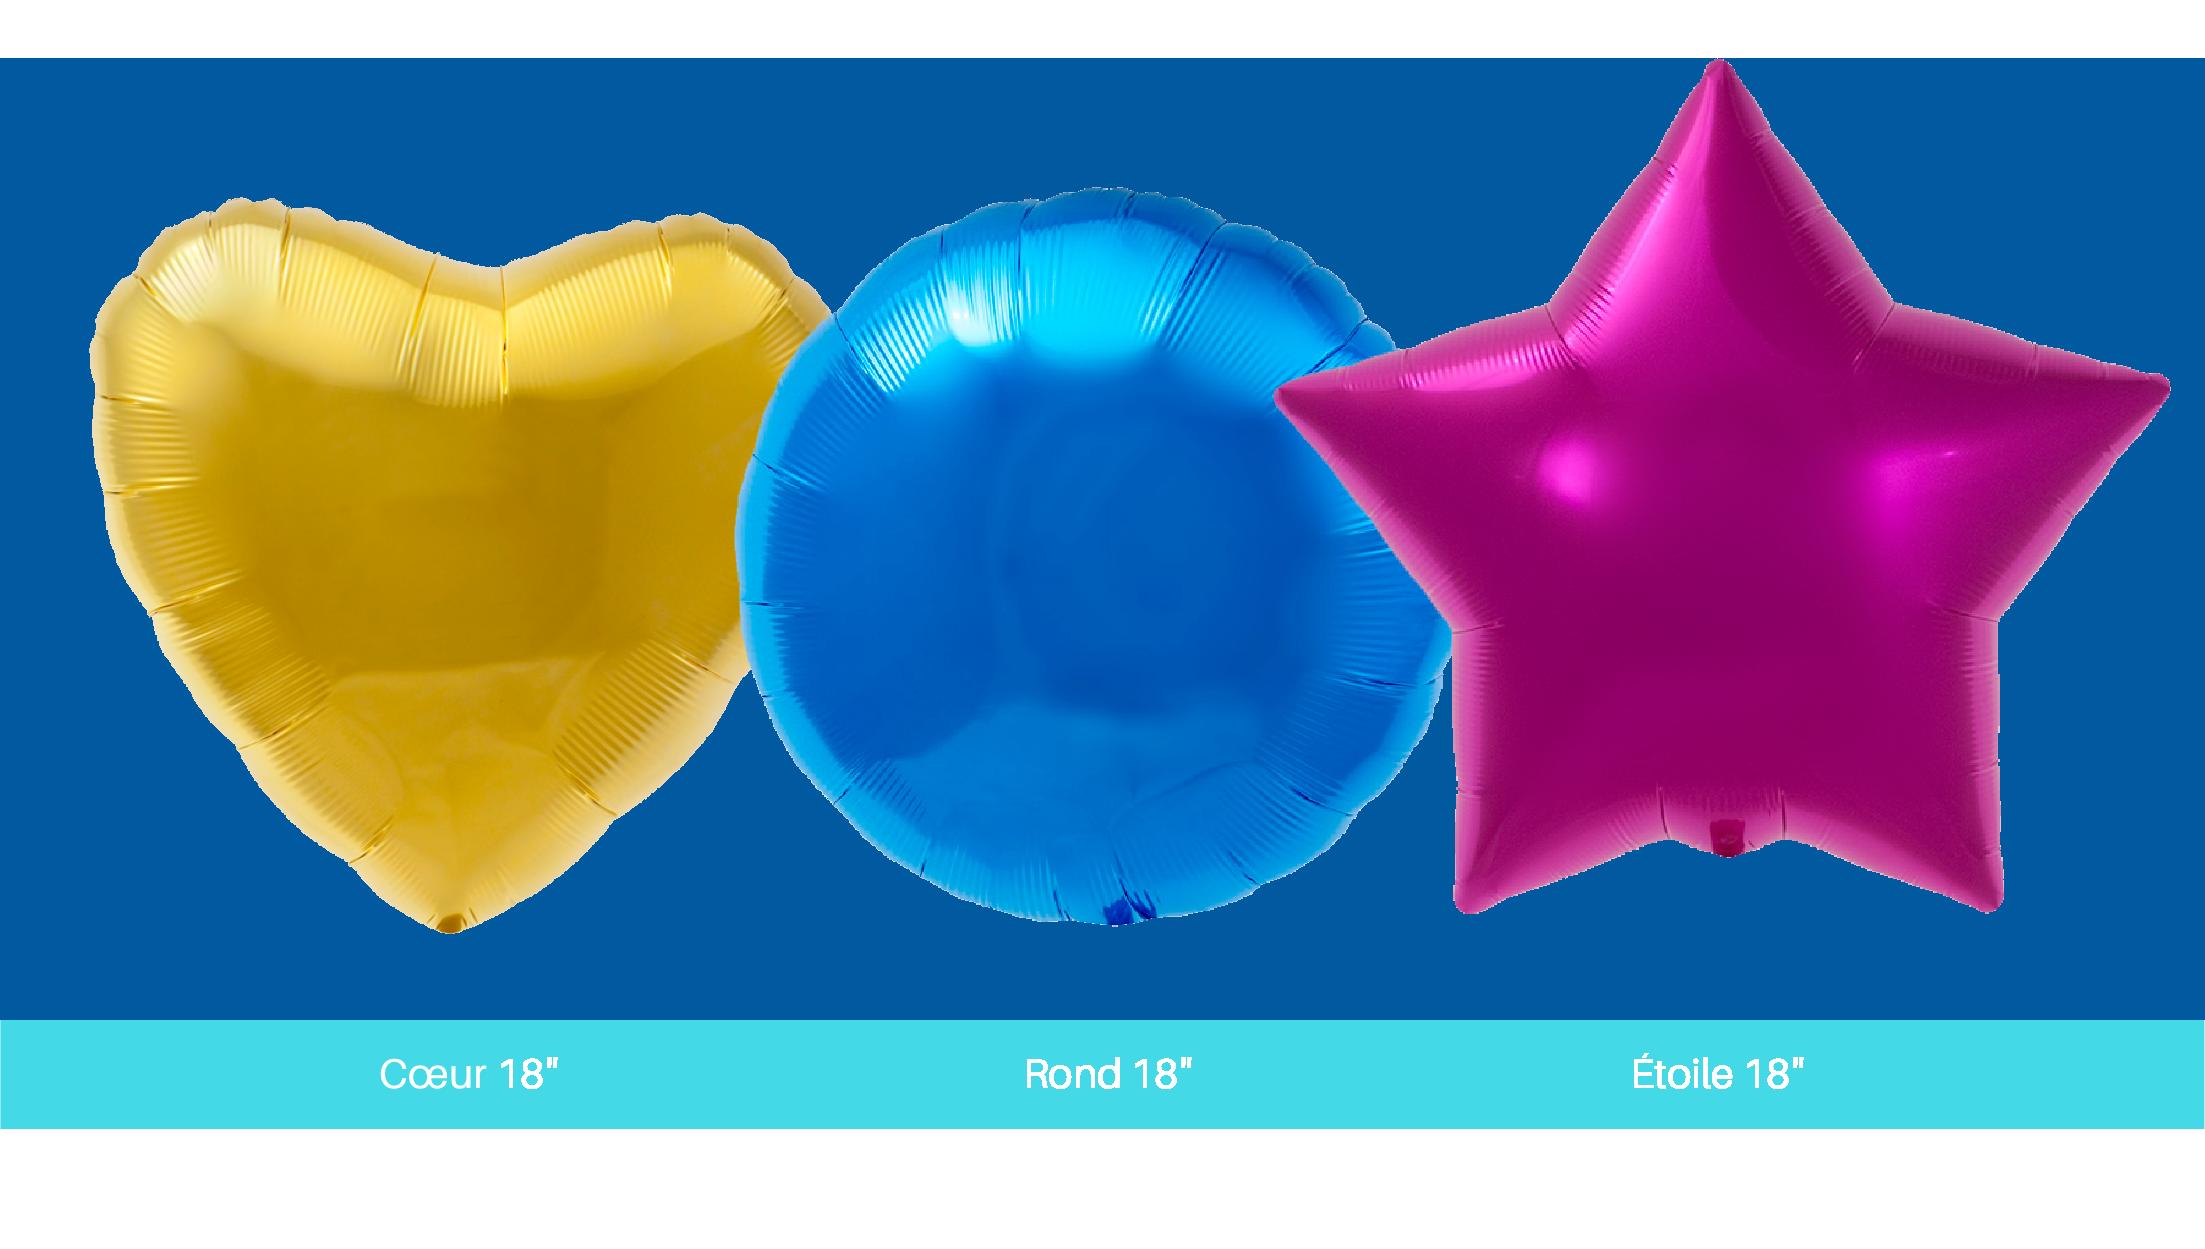 différentes tailles formes ballons aluminium impression